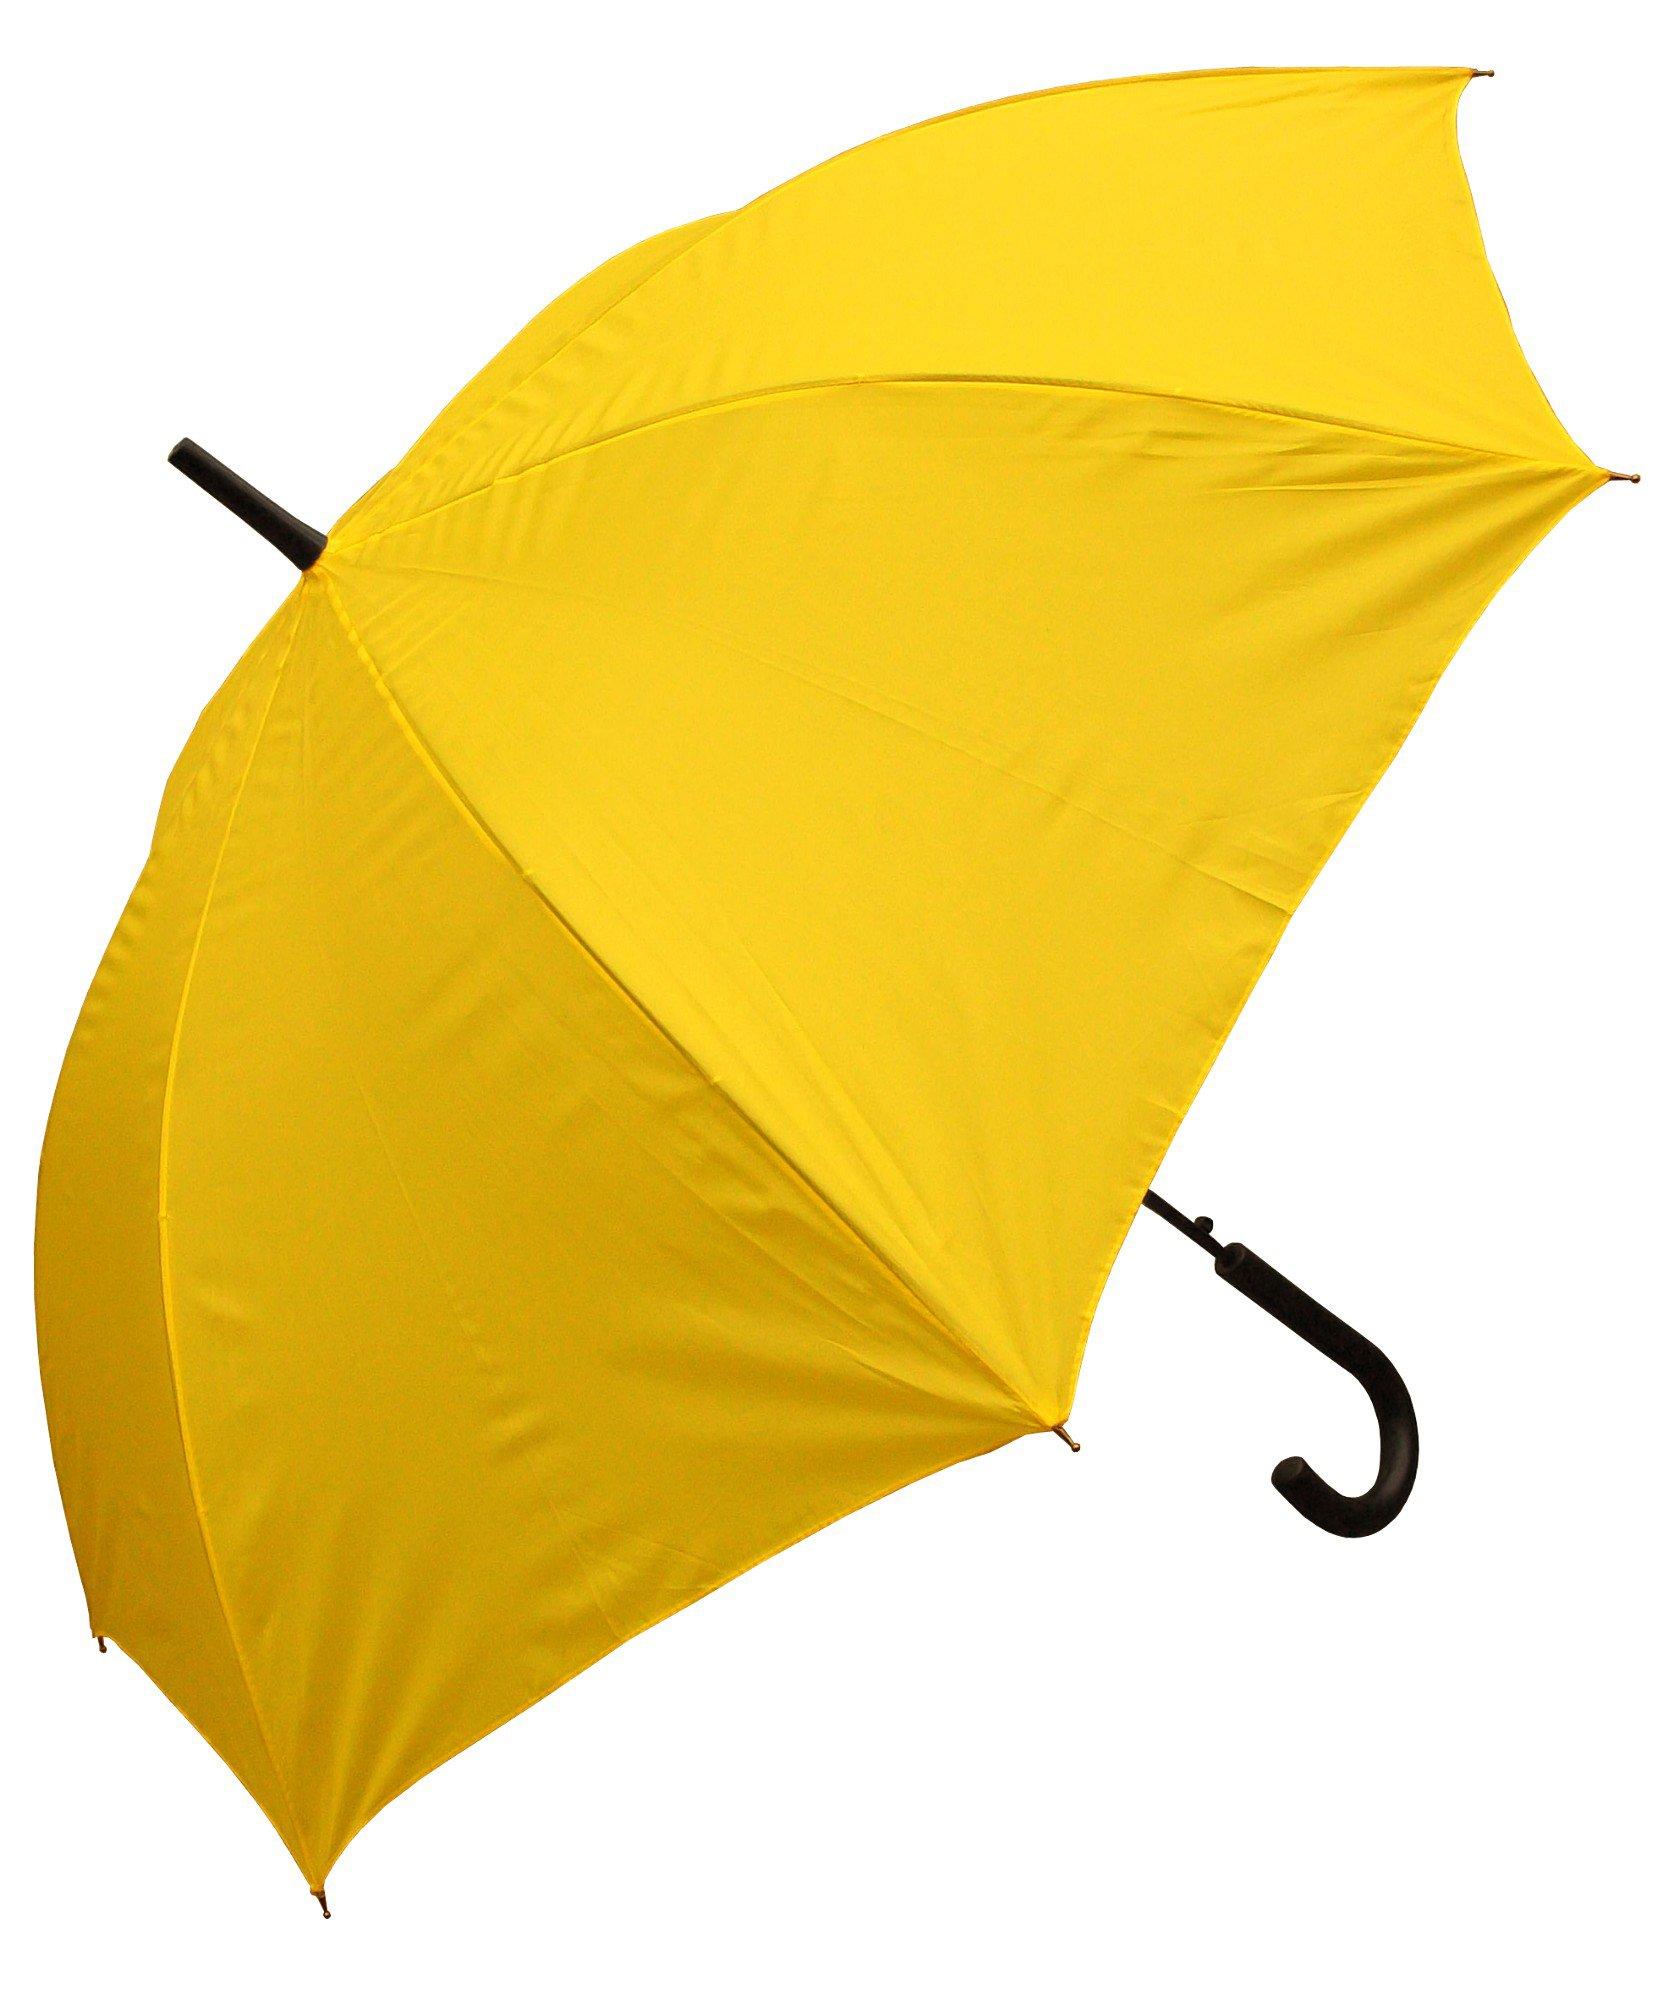 RainStoppers W032TH Auto Open European Hook Handle Arc Umbrella, Yellow, 48''